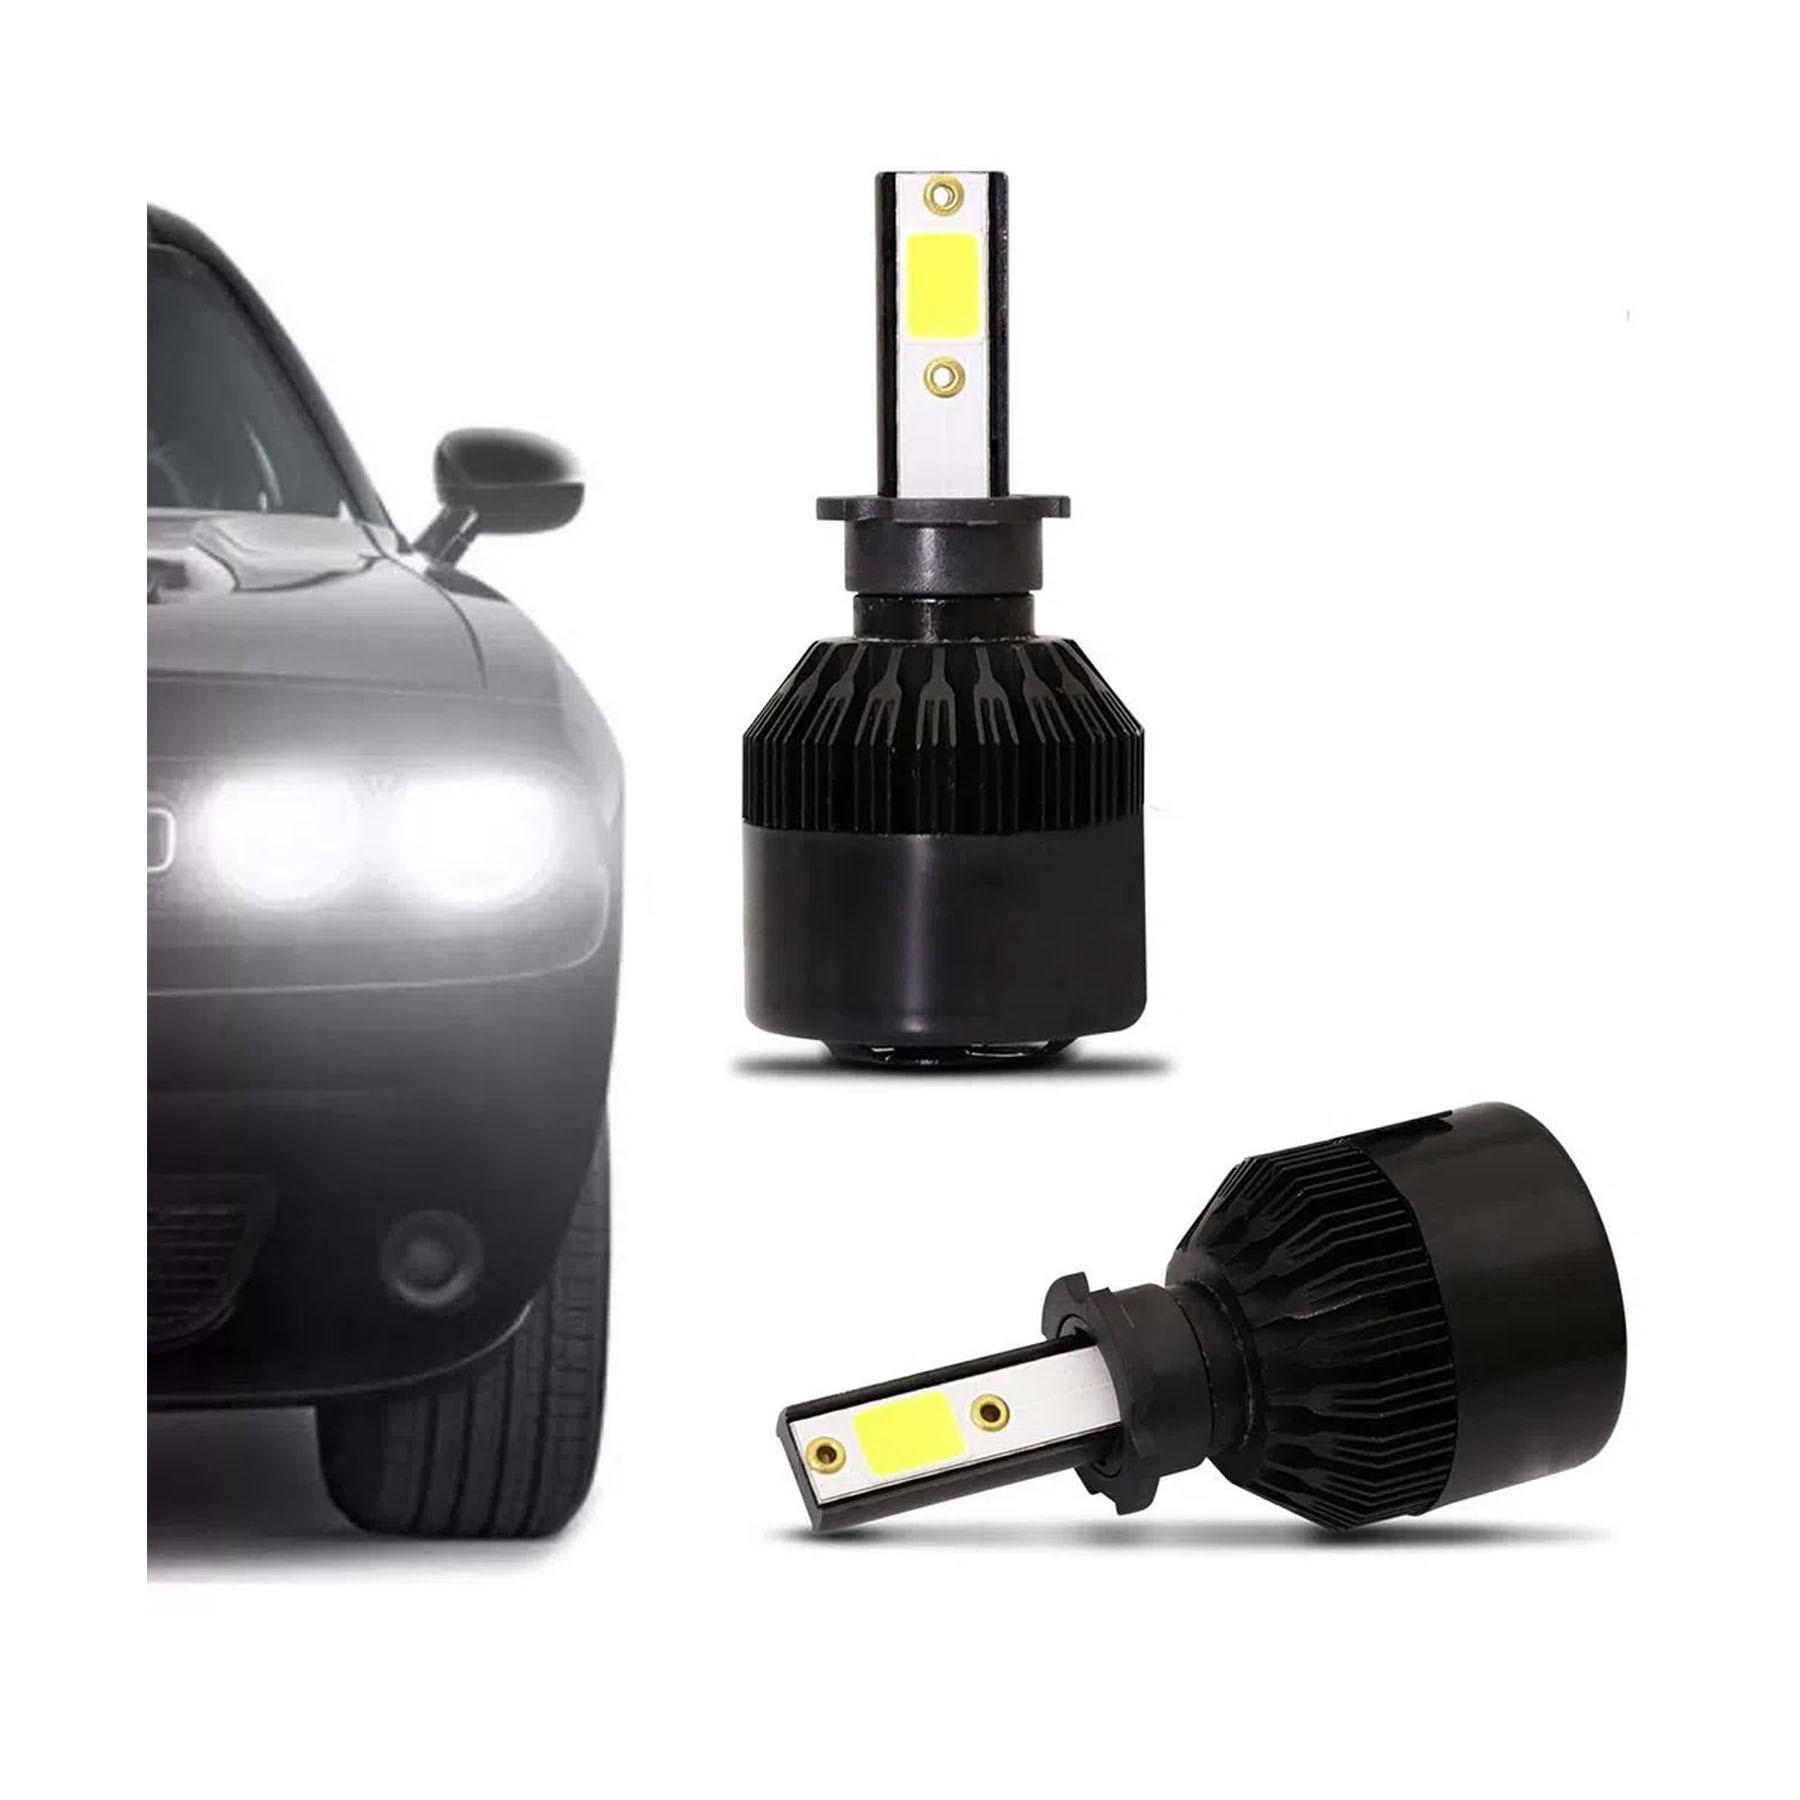 Par Lâmpadas Super LED Standard H3 6000K 74W 7800 Lúmens Luz Branca tg1001h3